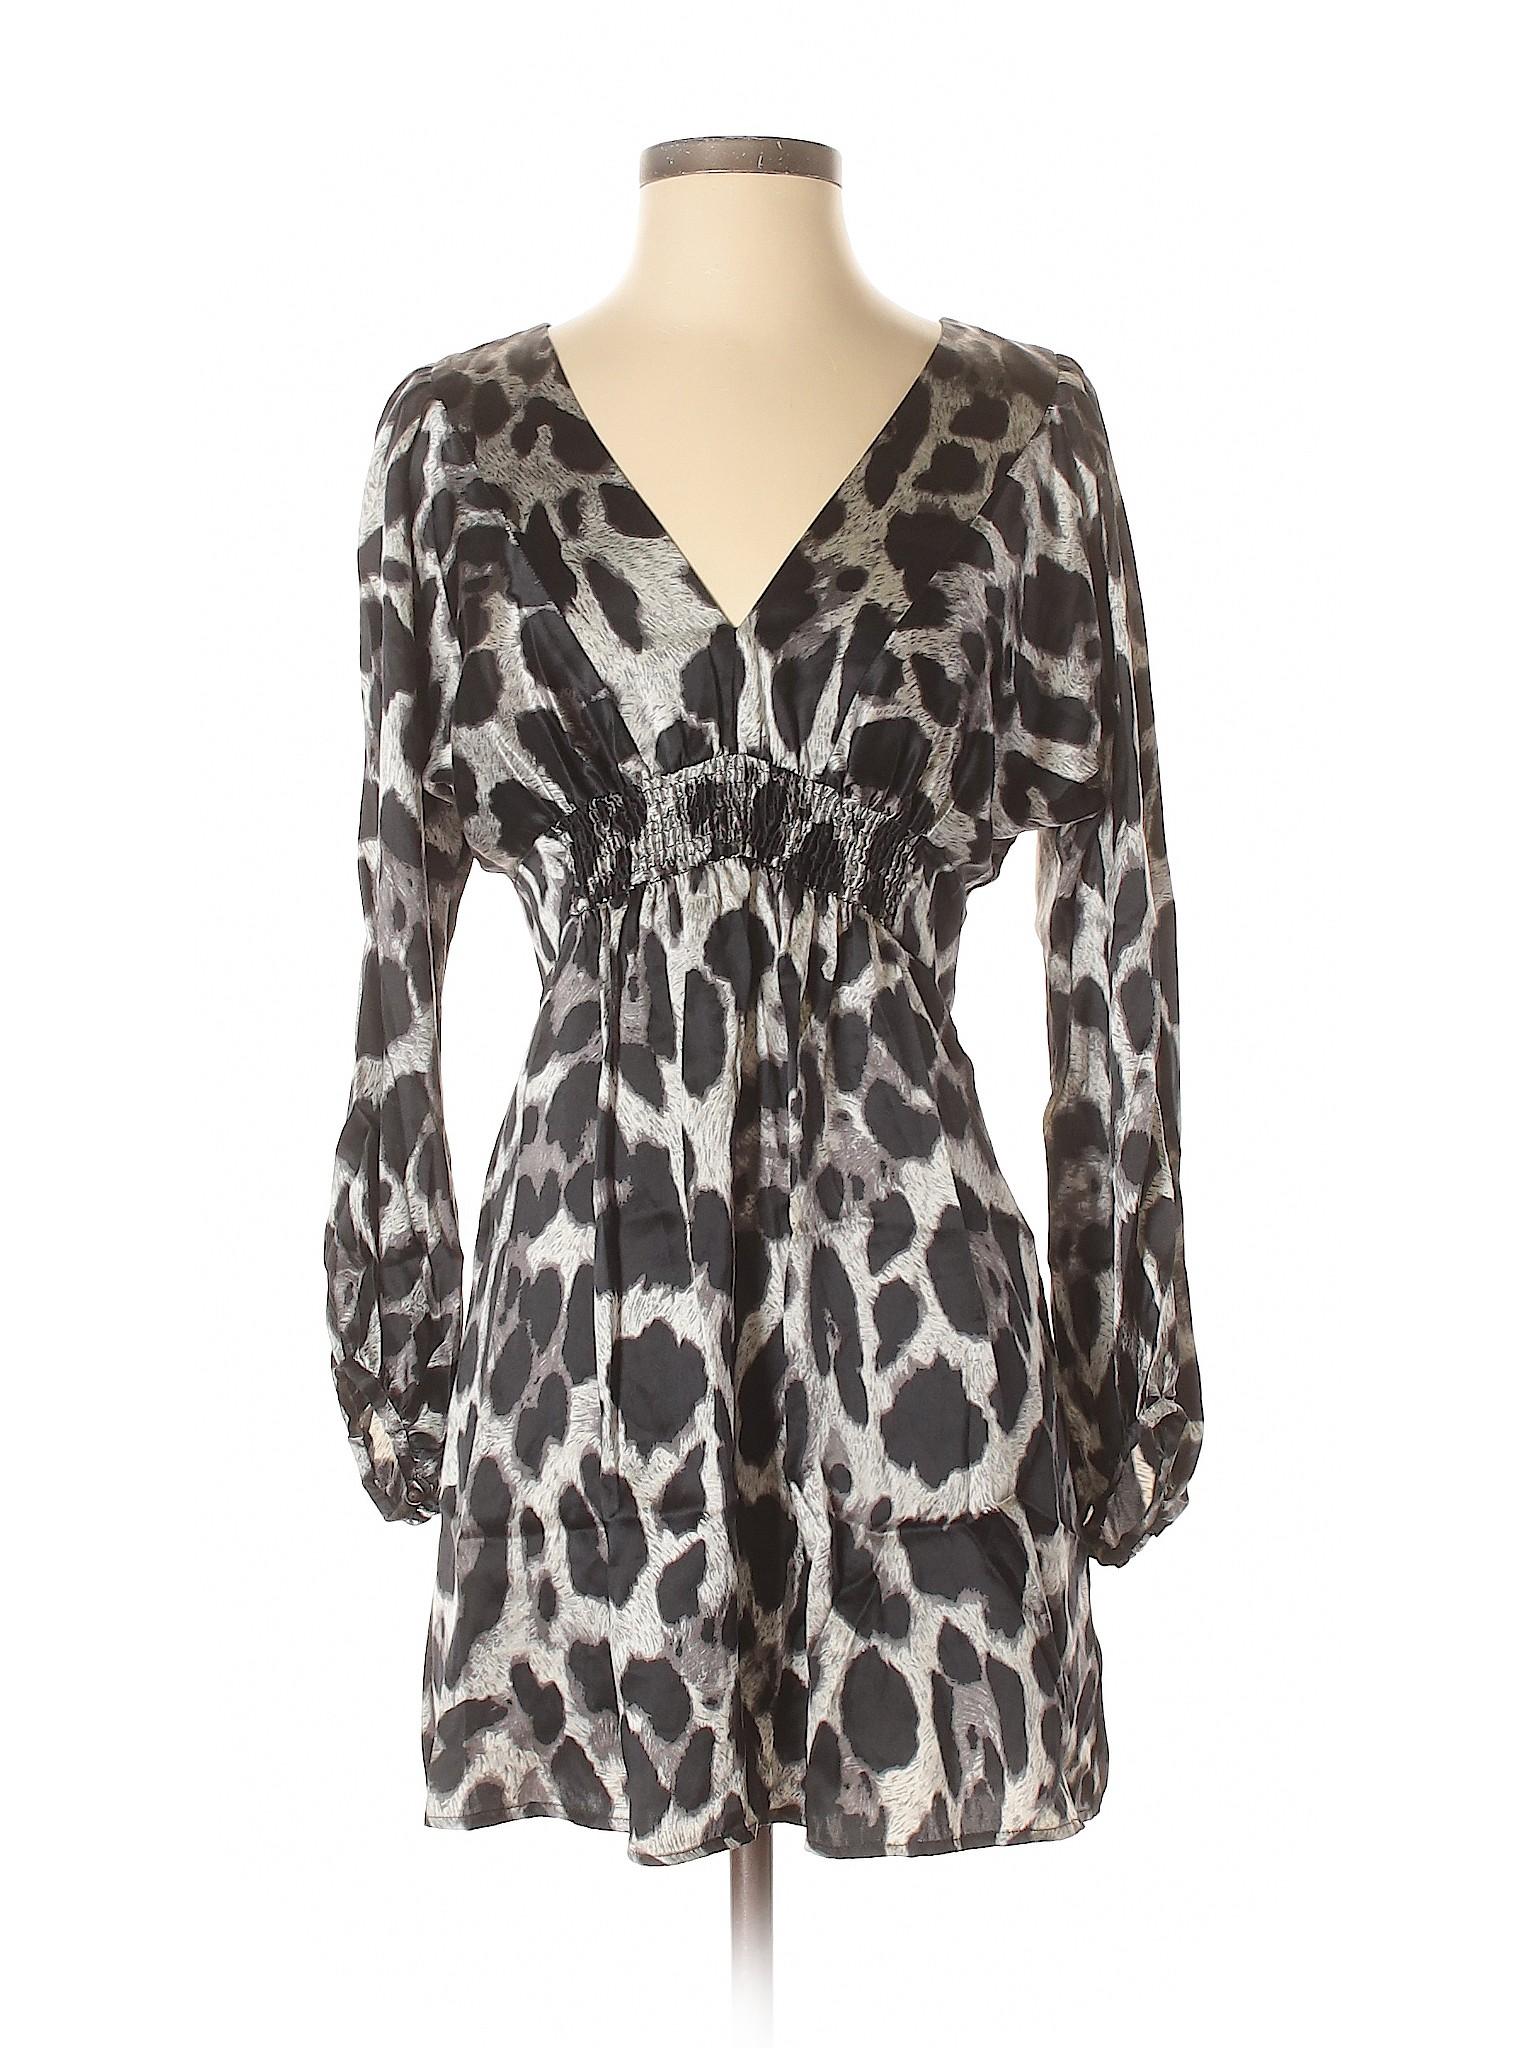 winter Dress Boutique Boutique winter Casual Joseph Joseph qYYP1t6Fw